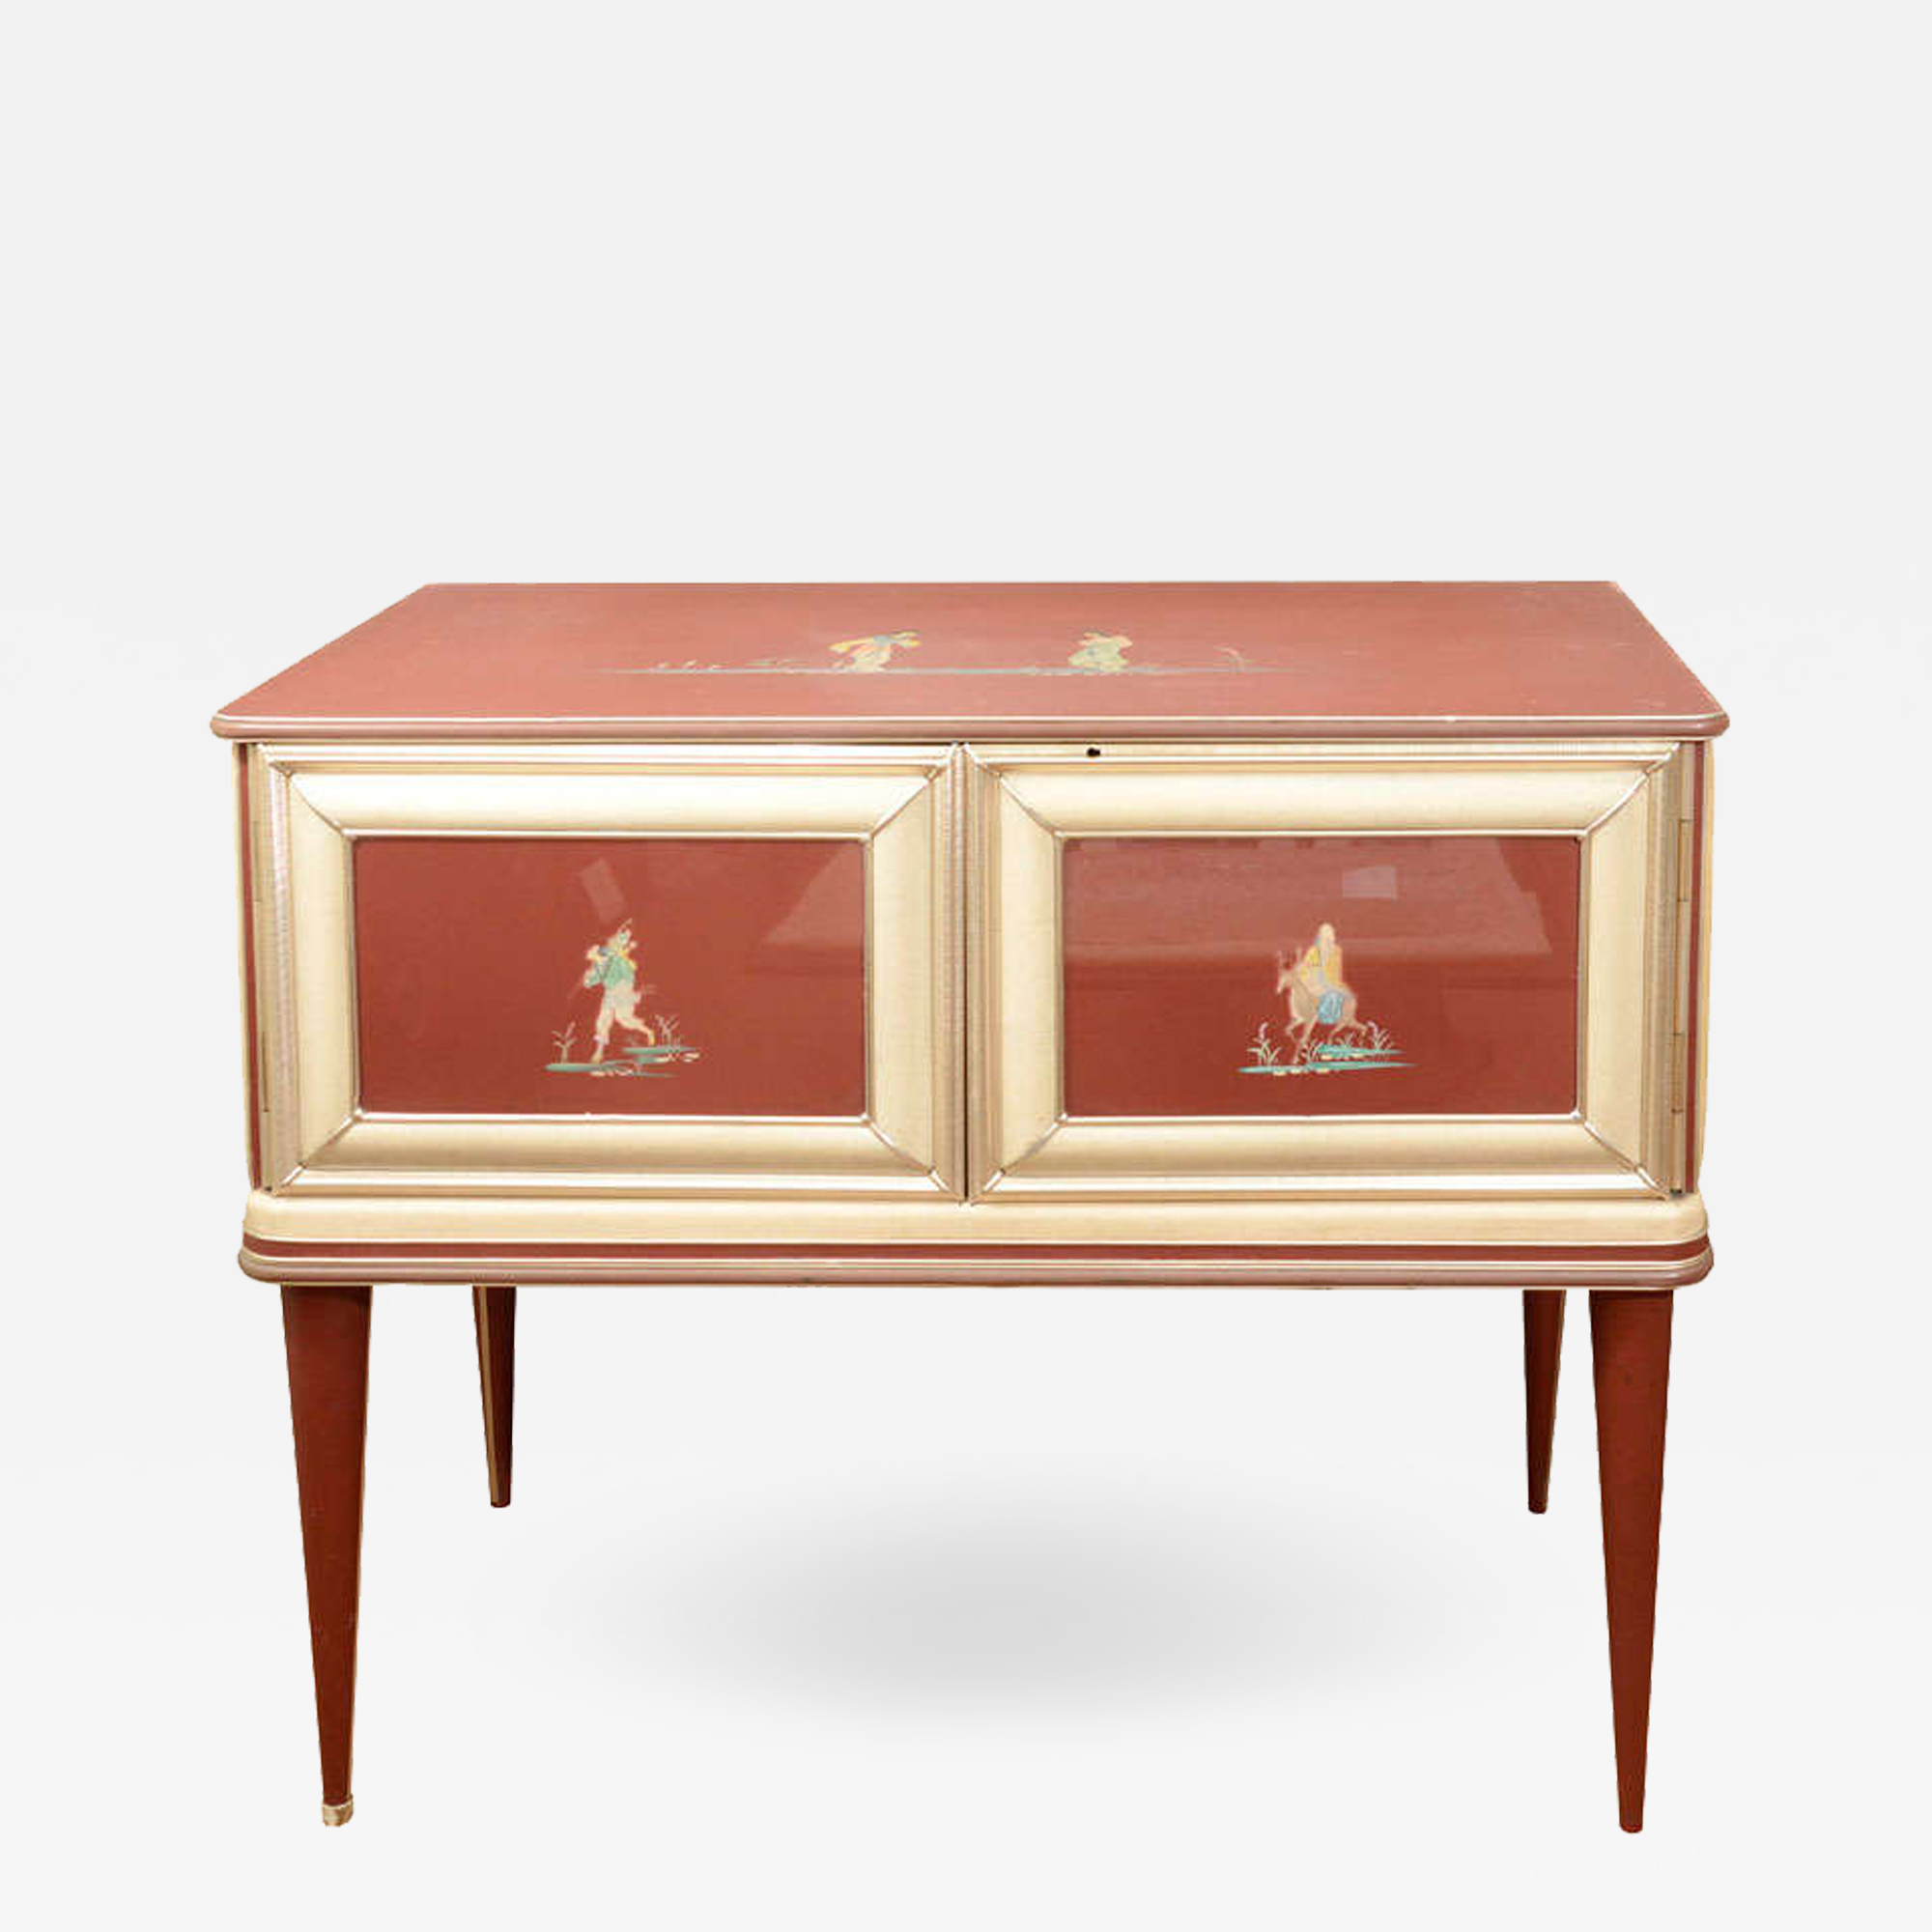 Umberto Mascagni Sideboard Or Credenza Modern Bar Cabinet